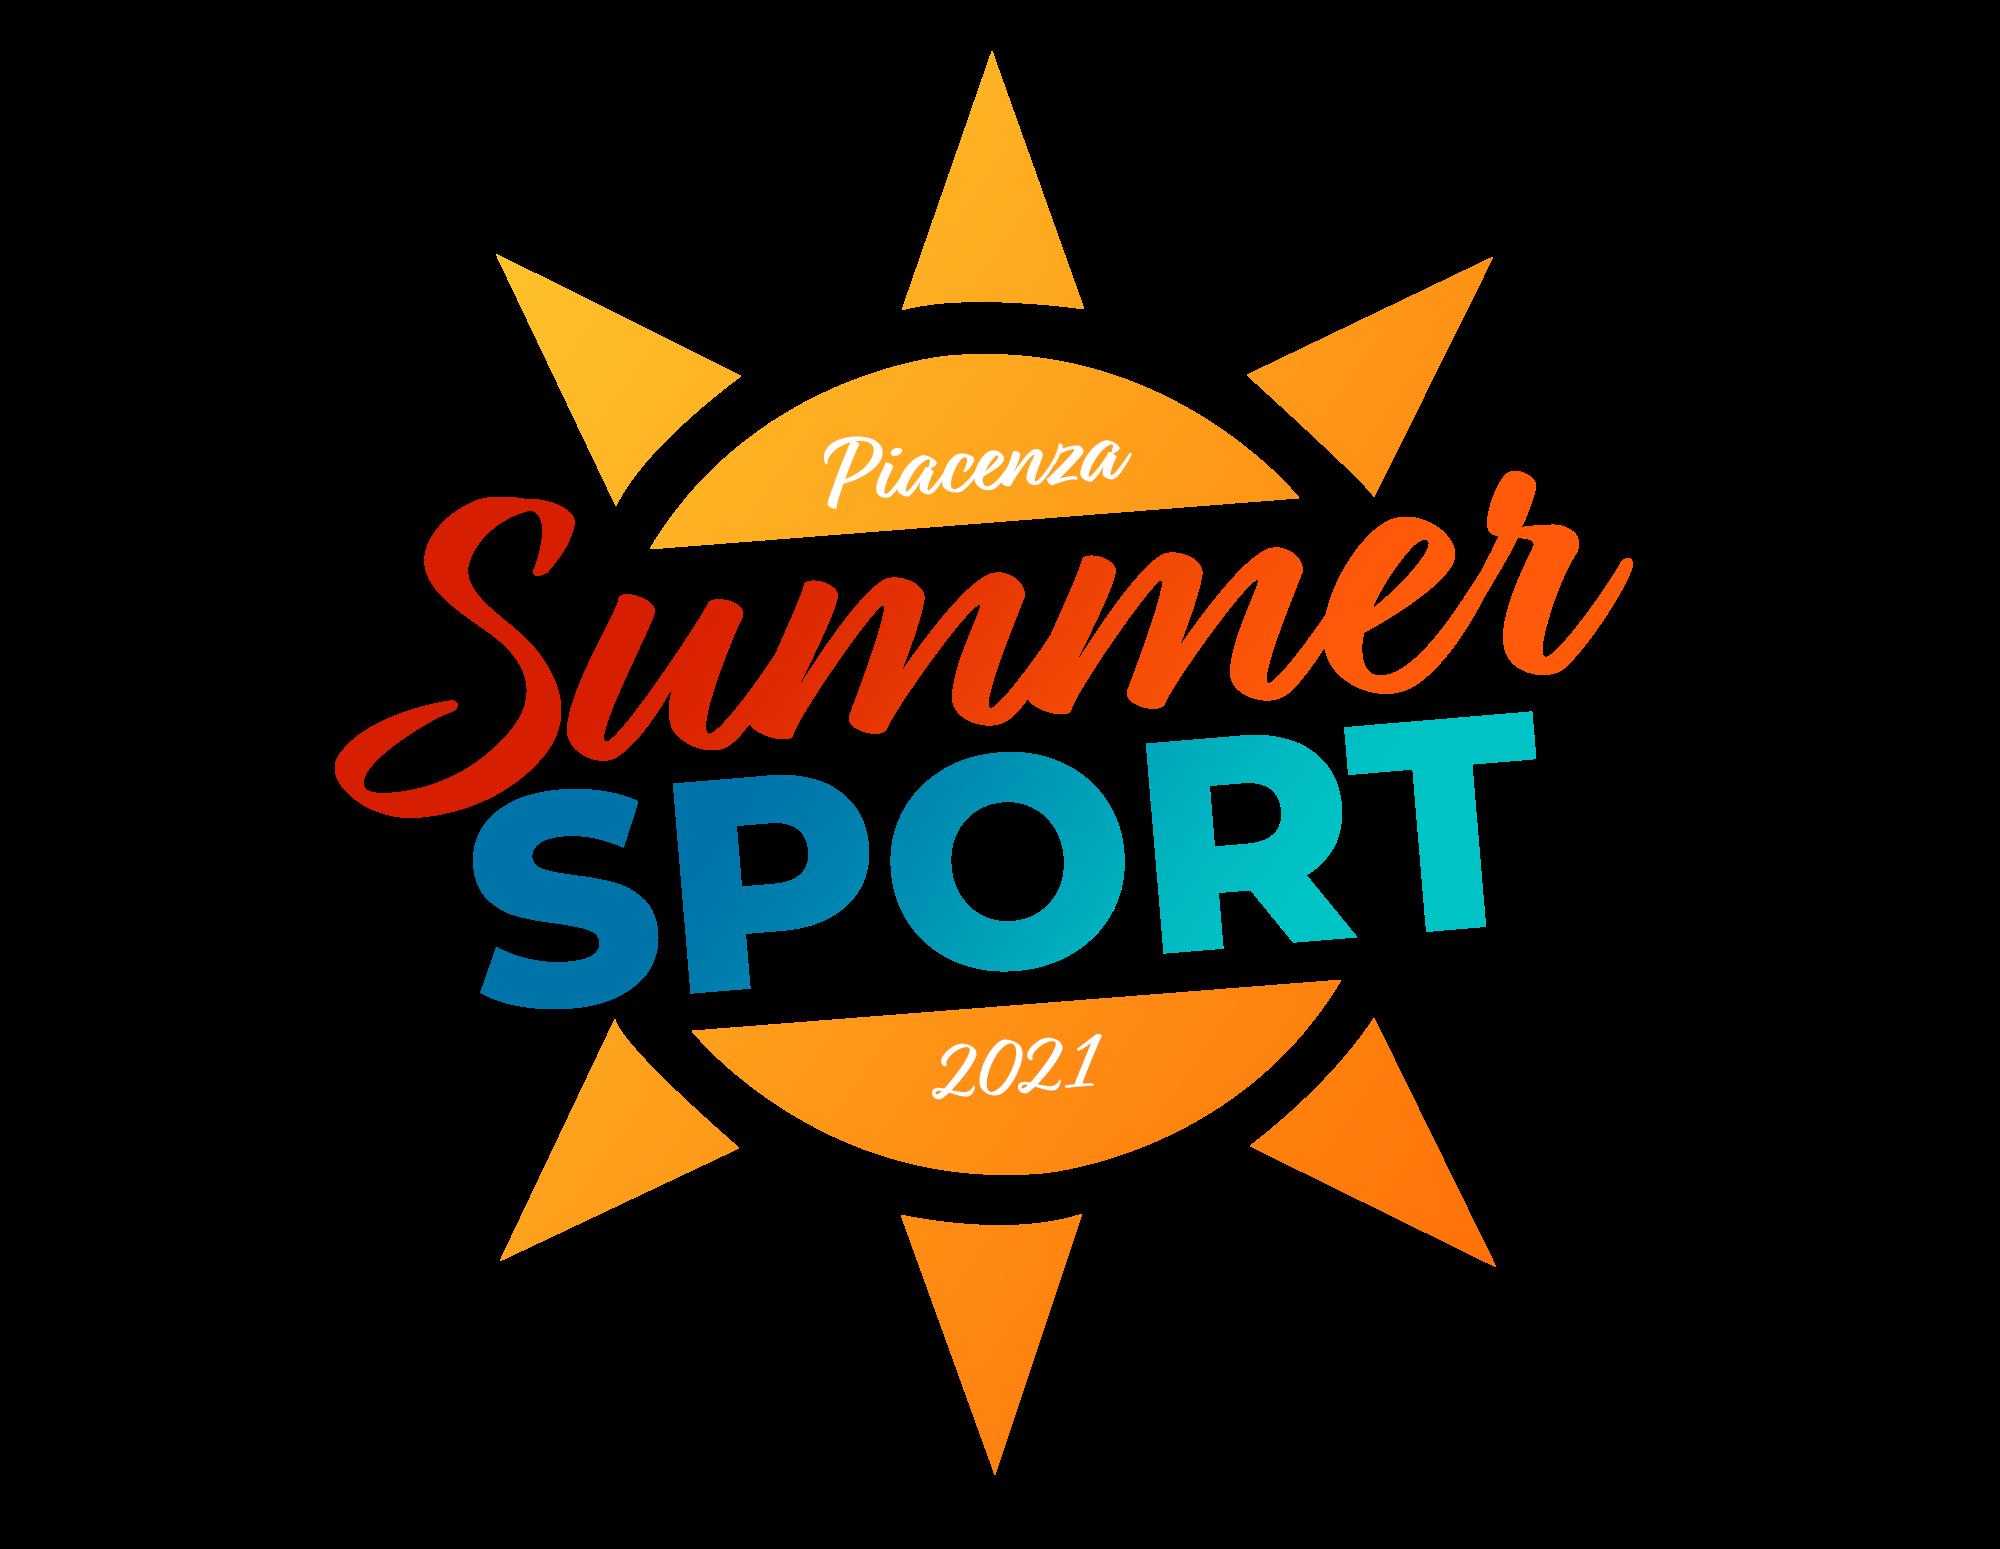 Piacenza Summer Sport